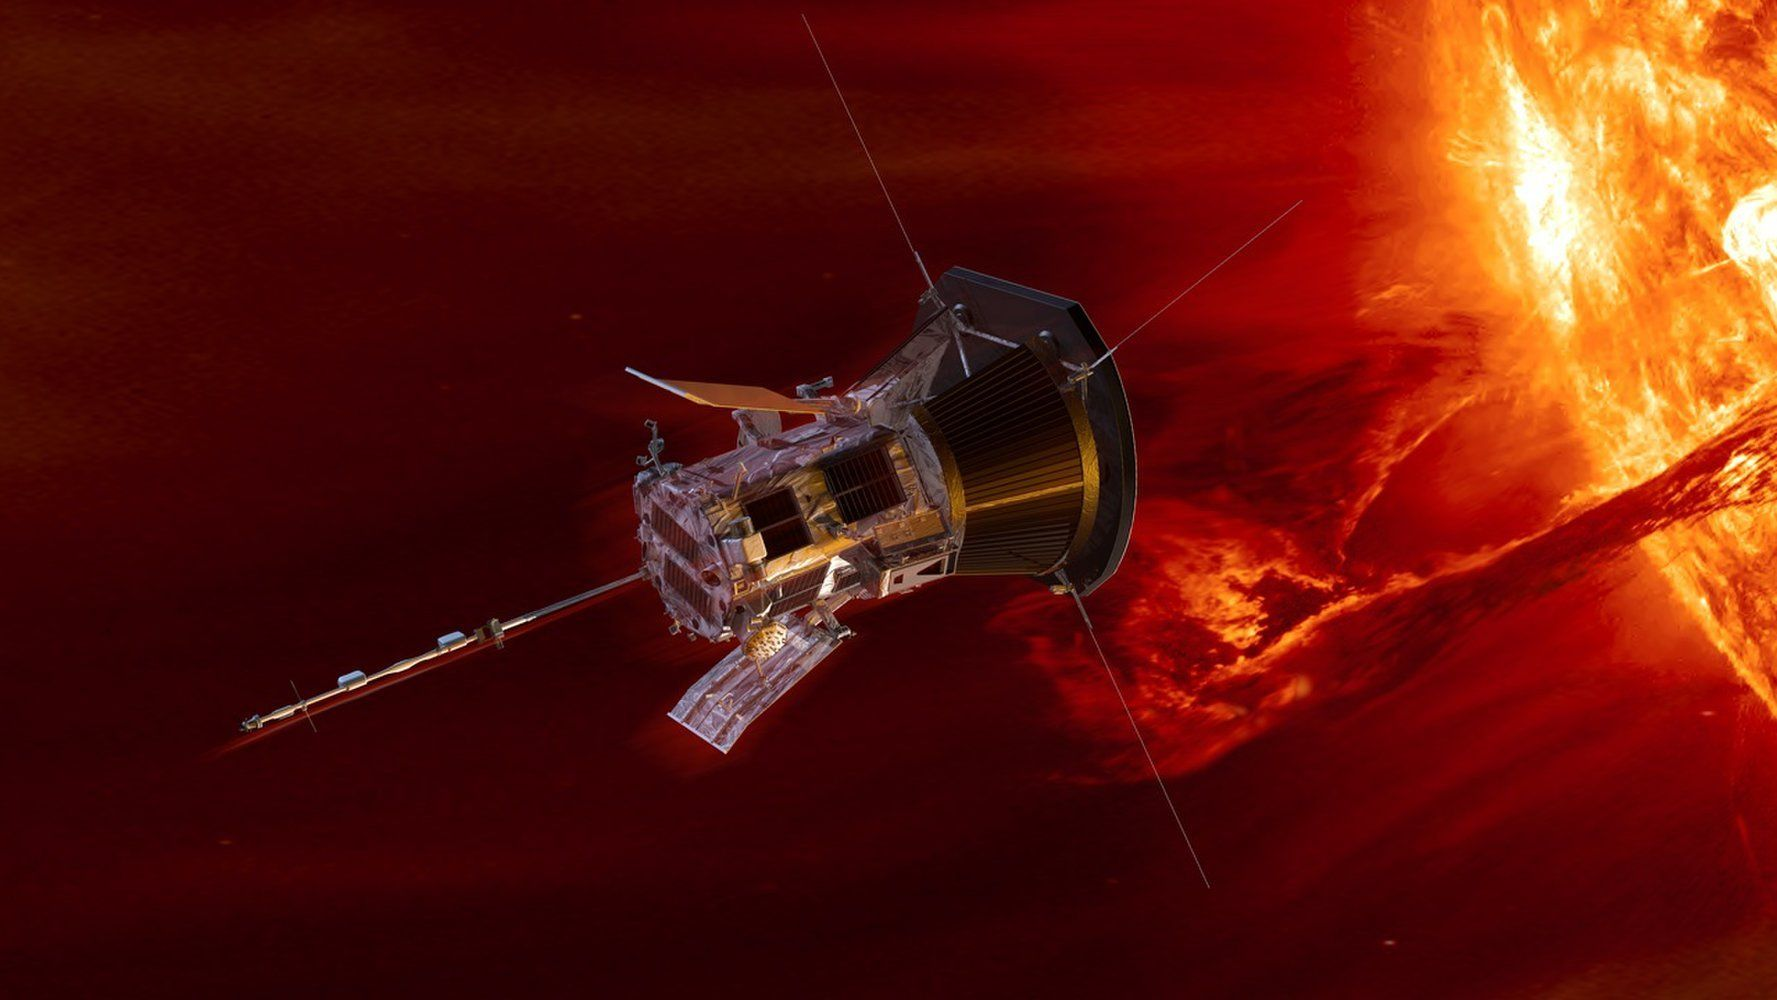 An artist's impression of NASA's Parker Solar Probe orbiting the Sun.